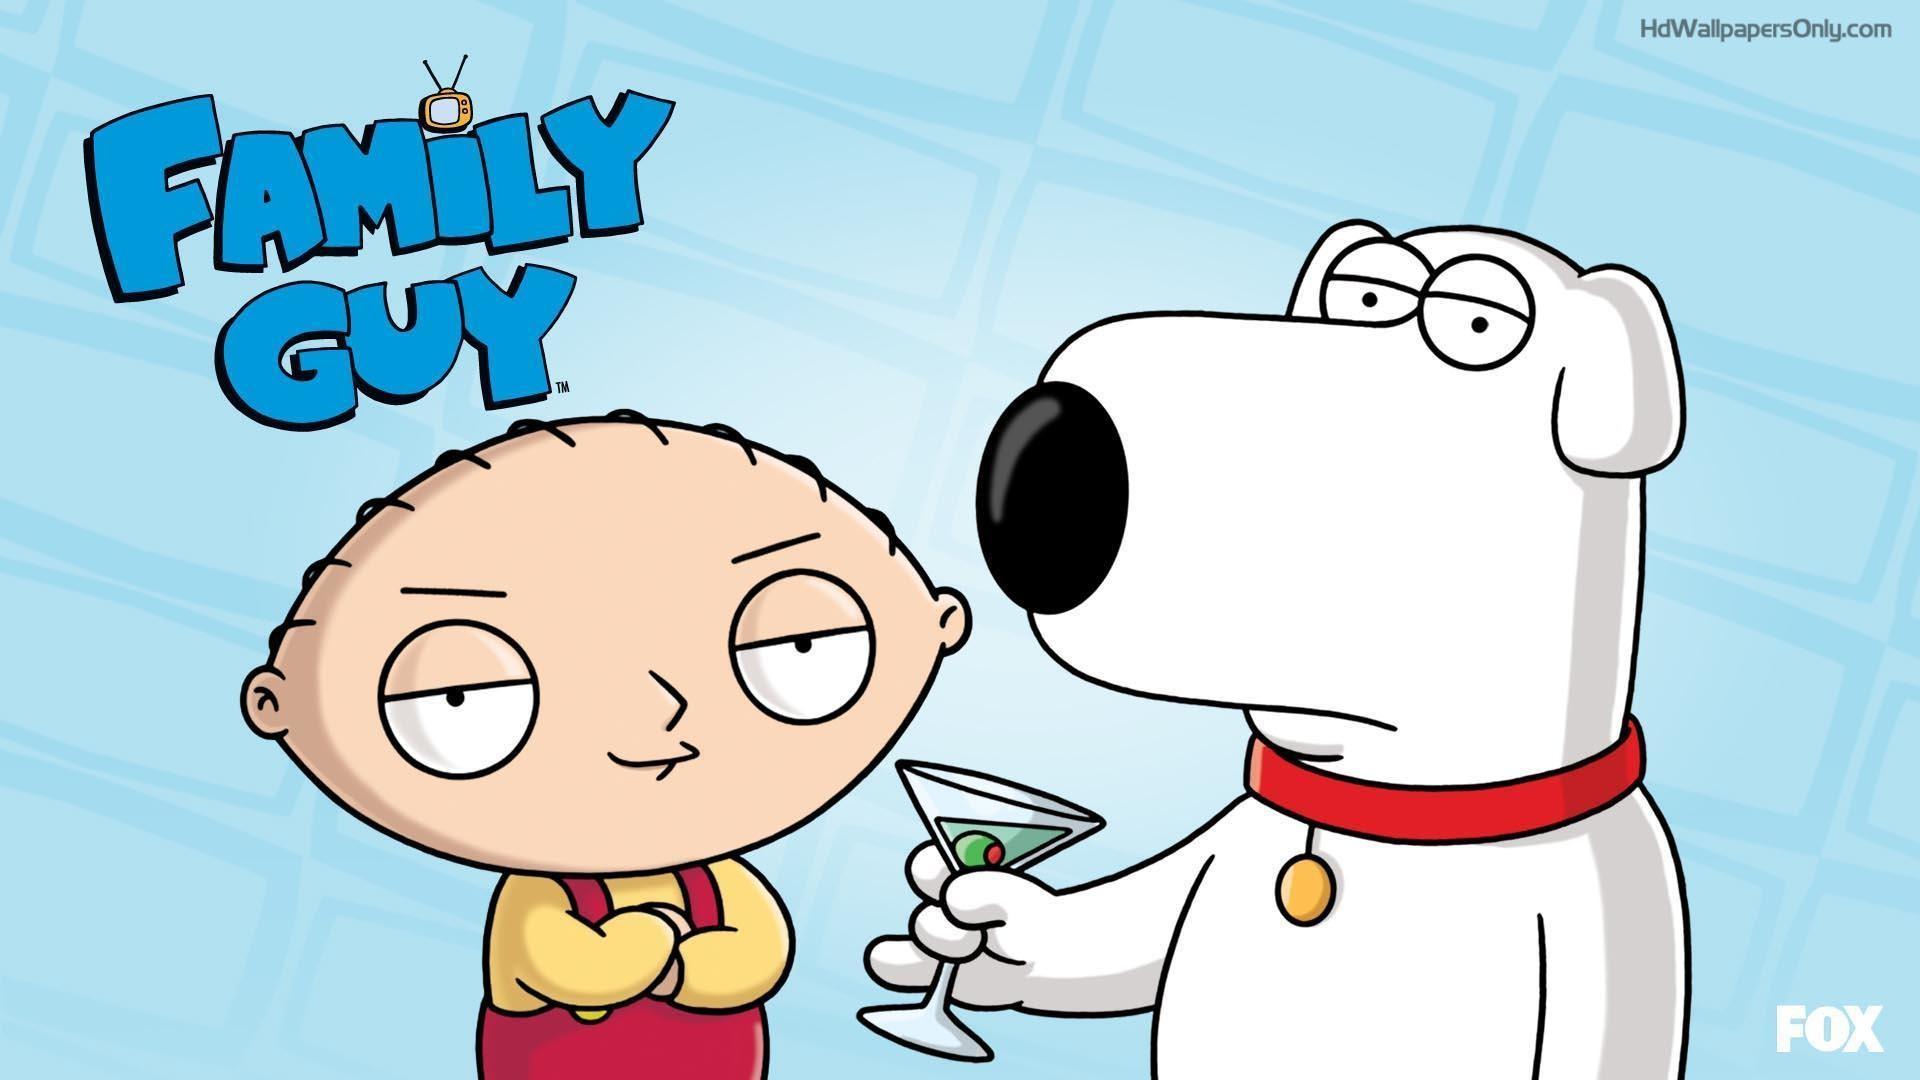 Family Guy Wallpapers – HD Wallpapers Inn